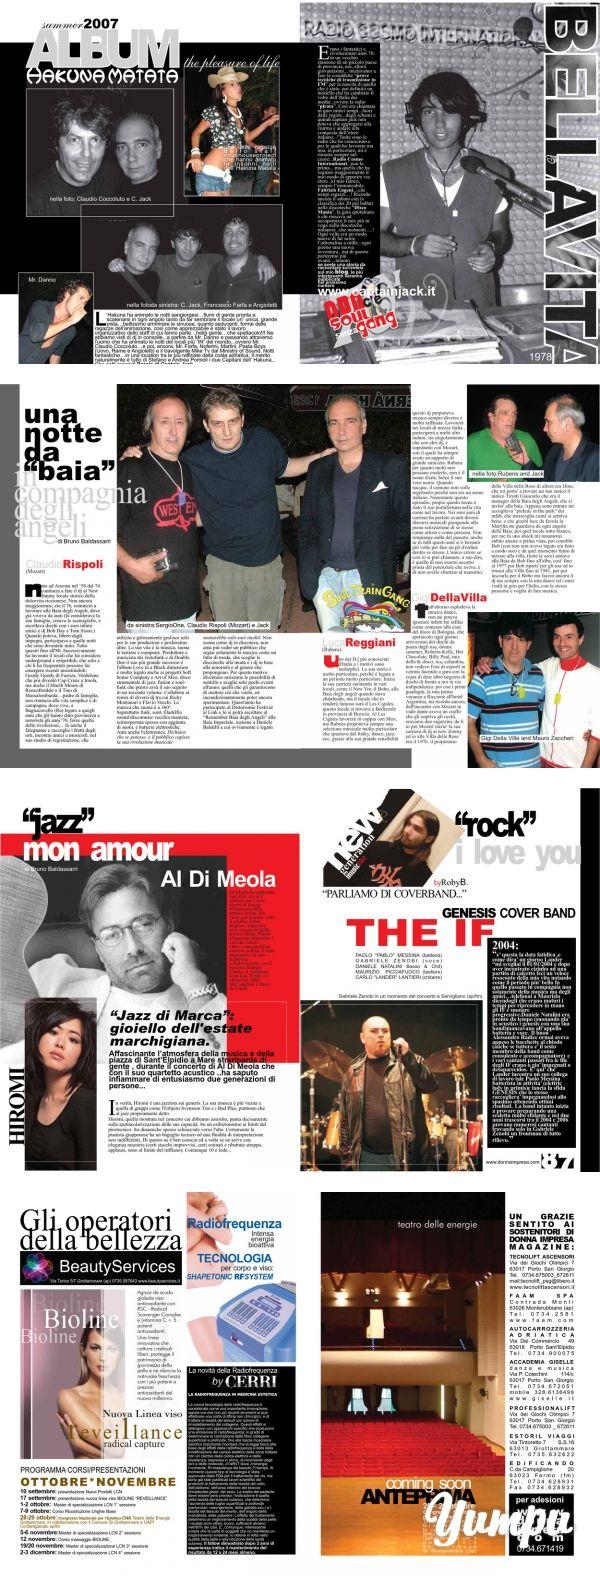 https://www.donnaimpresa.com - Donna Impresa Magazine - Magazine with 5 pages: c'è - Donna Impresa Magazine